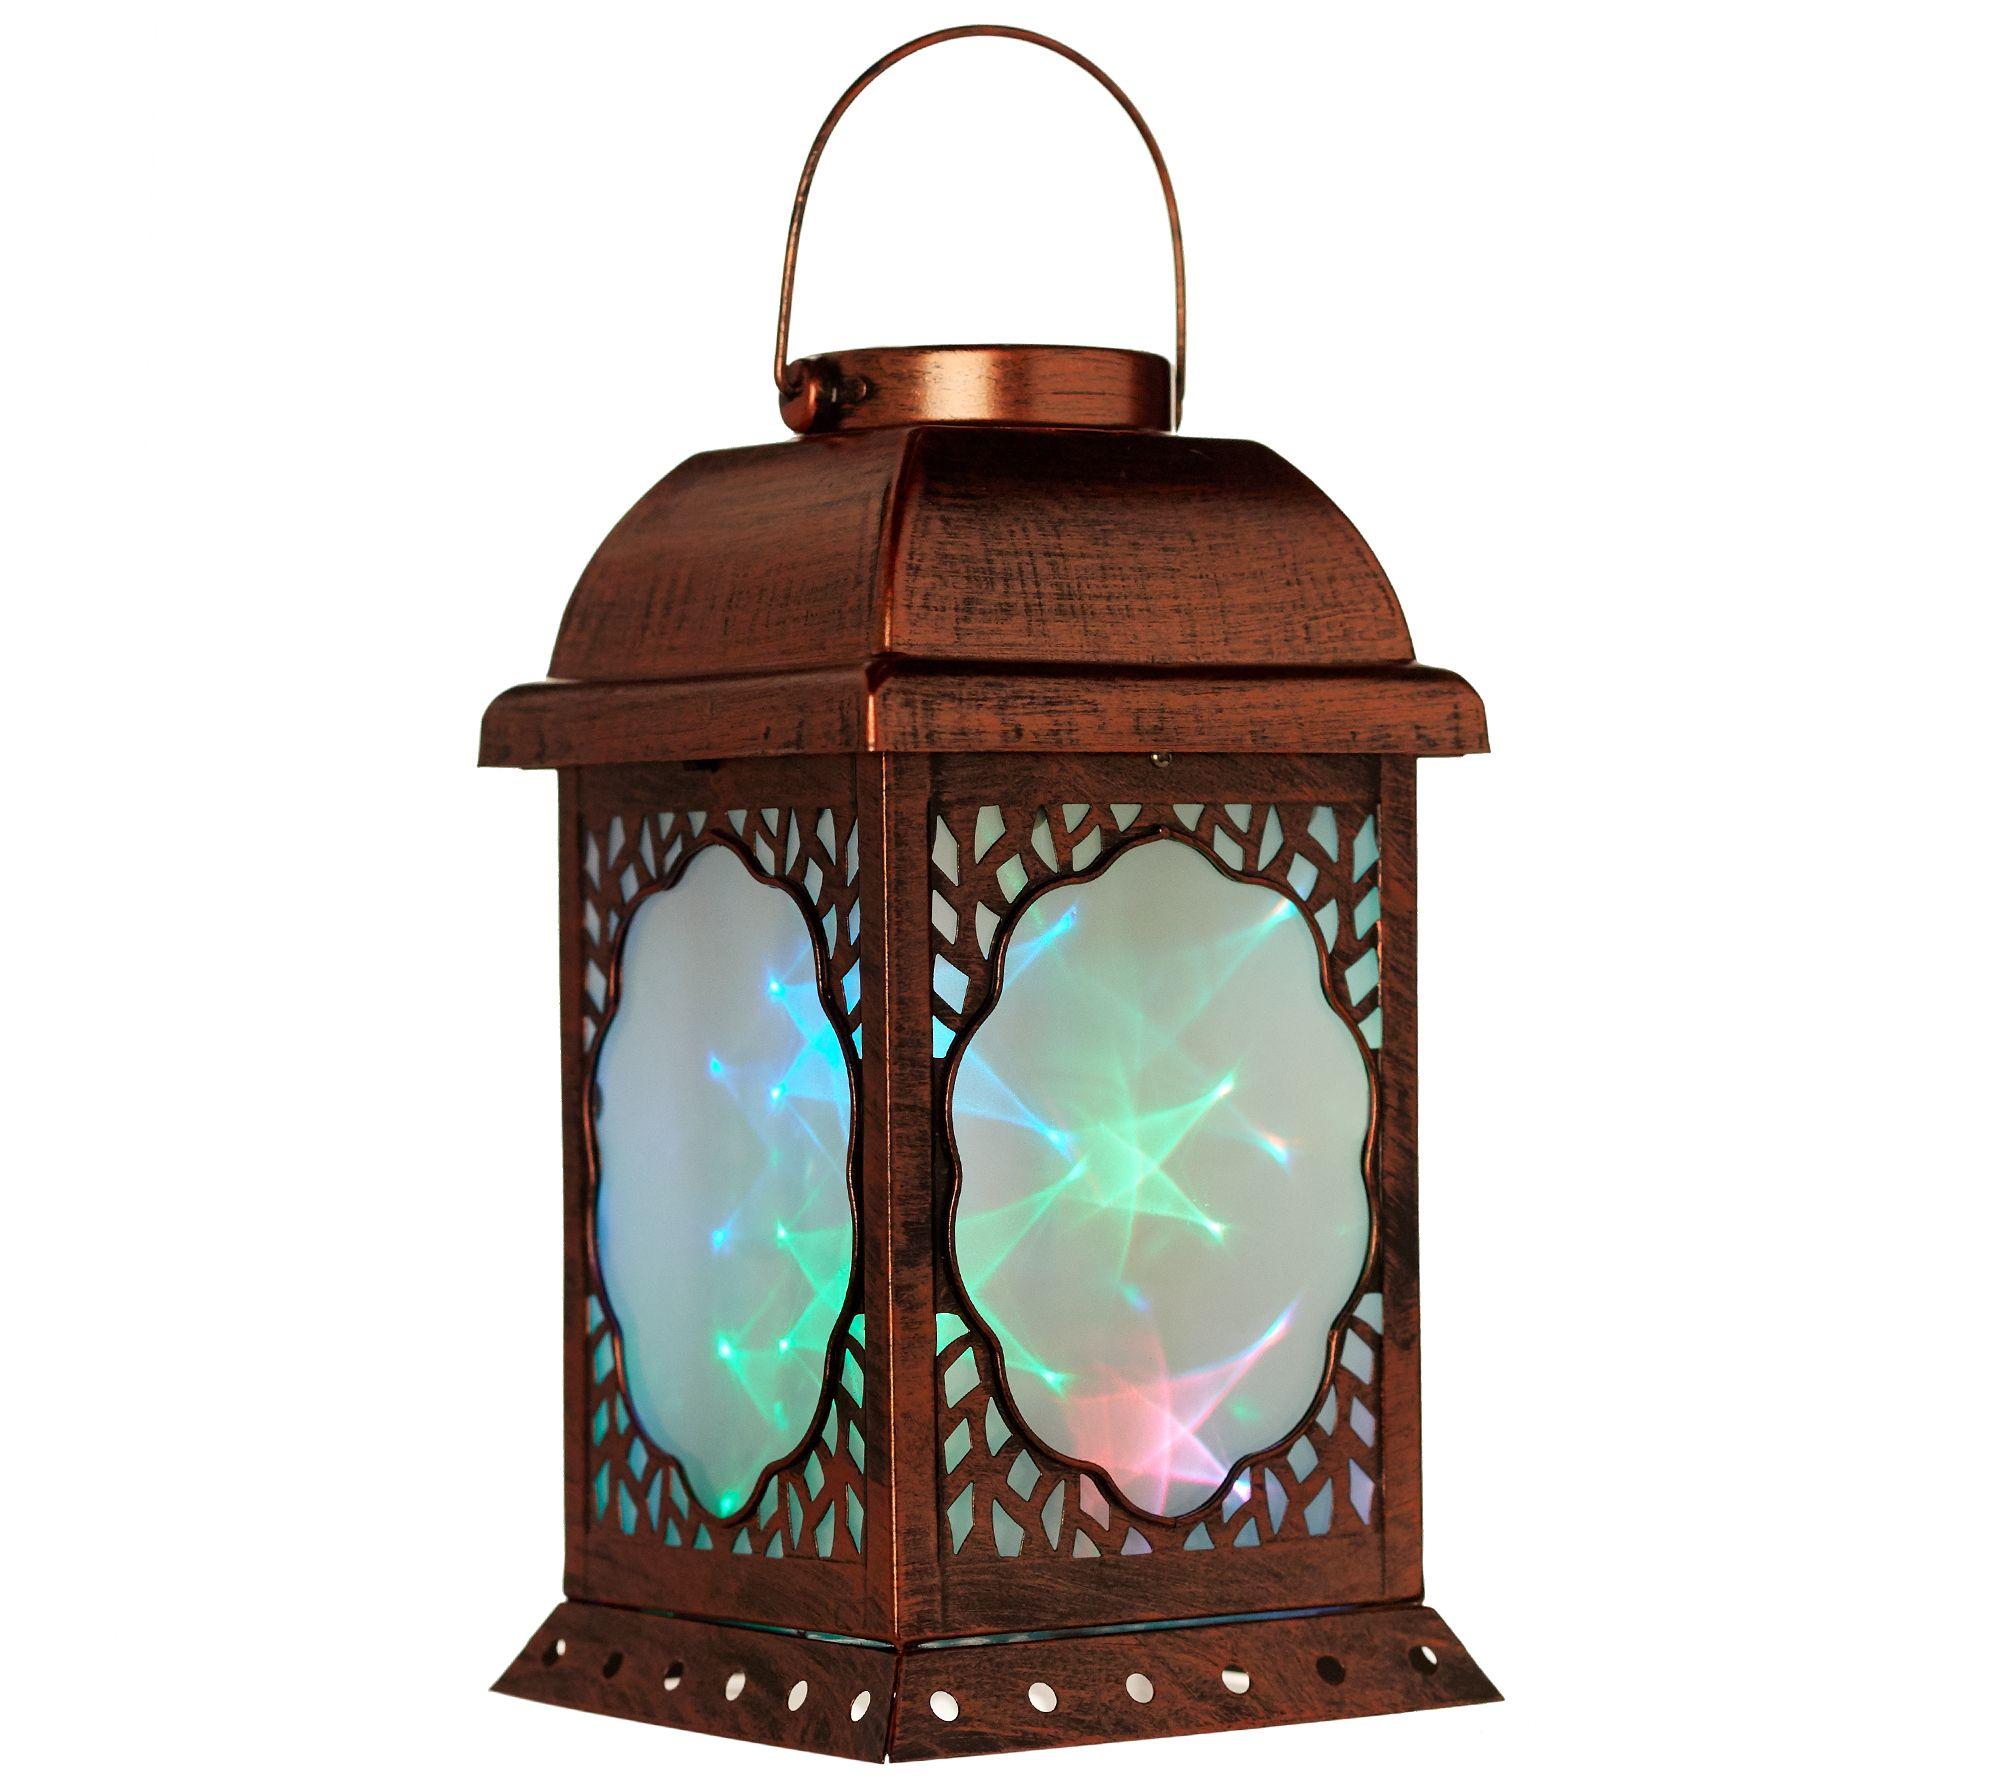 plow u0026 hearth solar lantern with holographic icons page 1 u2014 qvc com